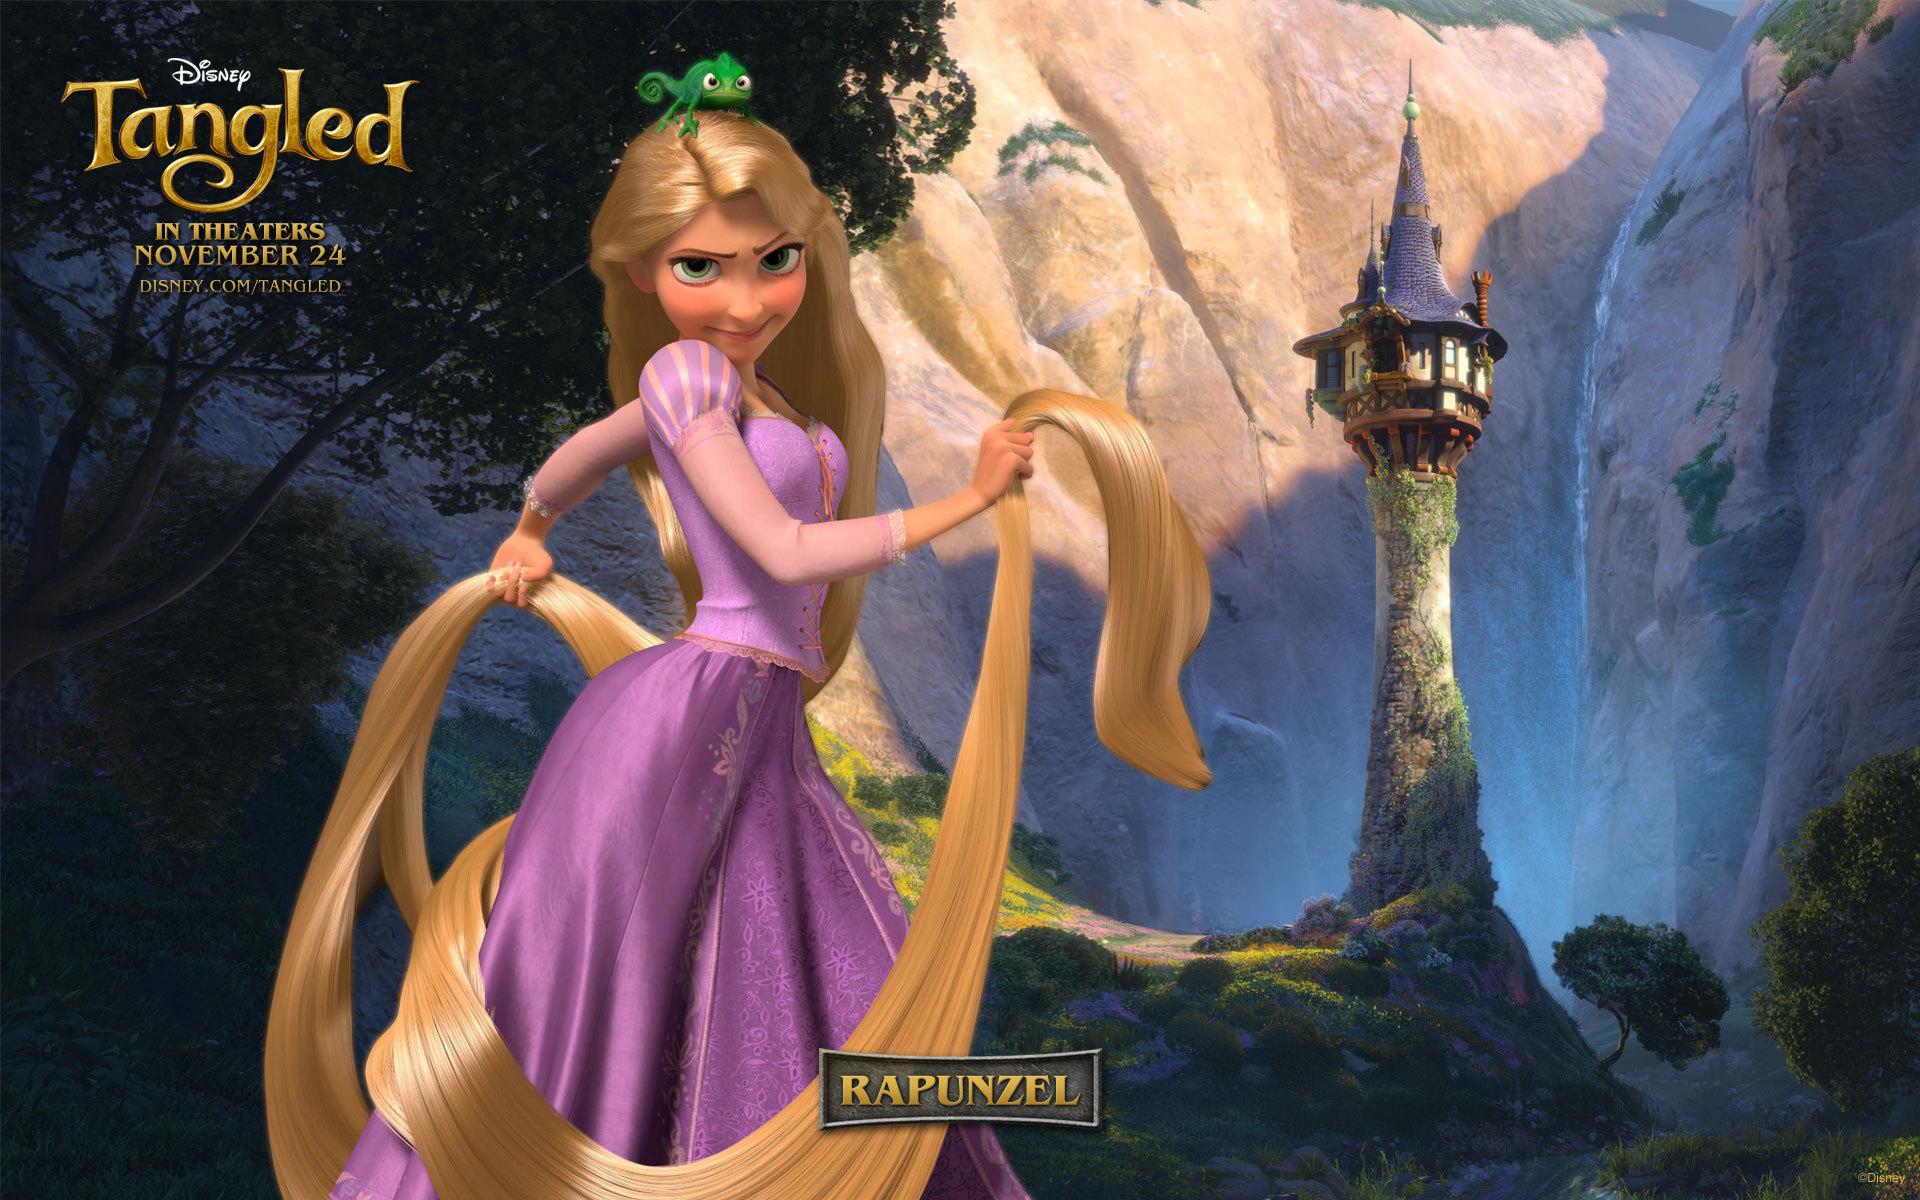 Tangled Disney Wallpaper   Princess Rapunzel from Tangled 1920x1200